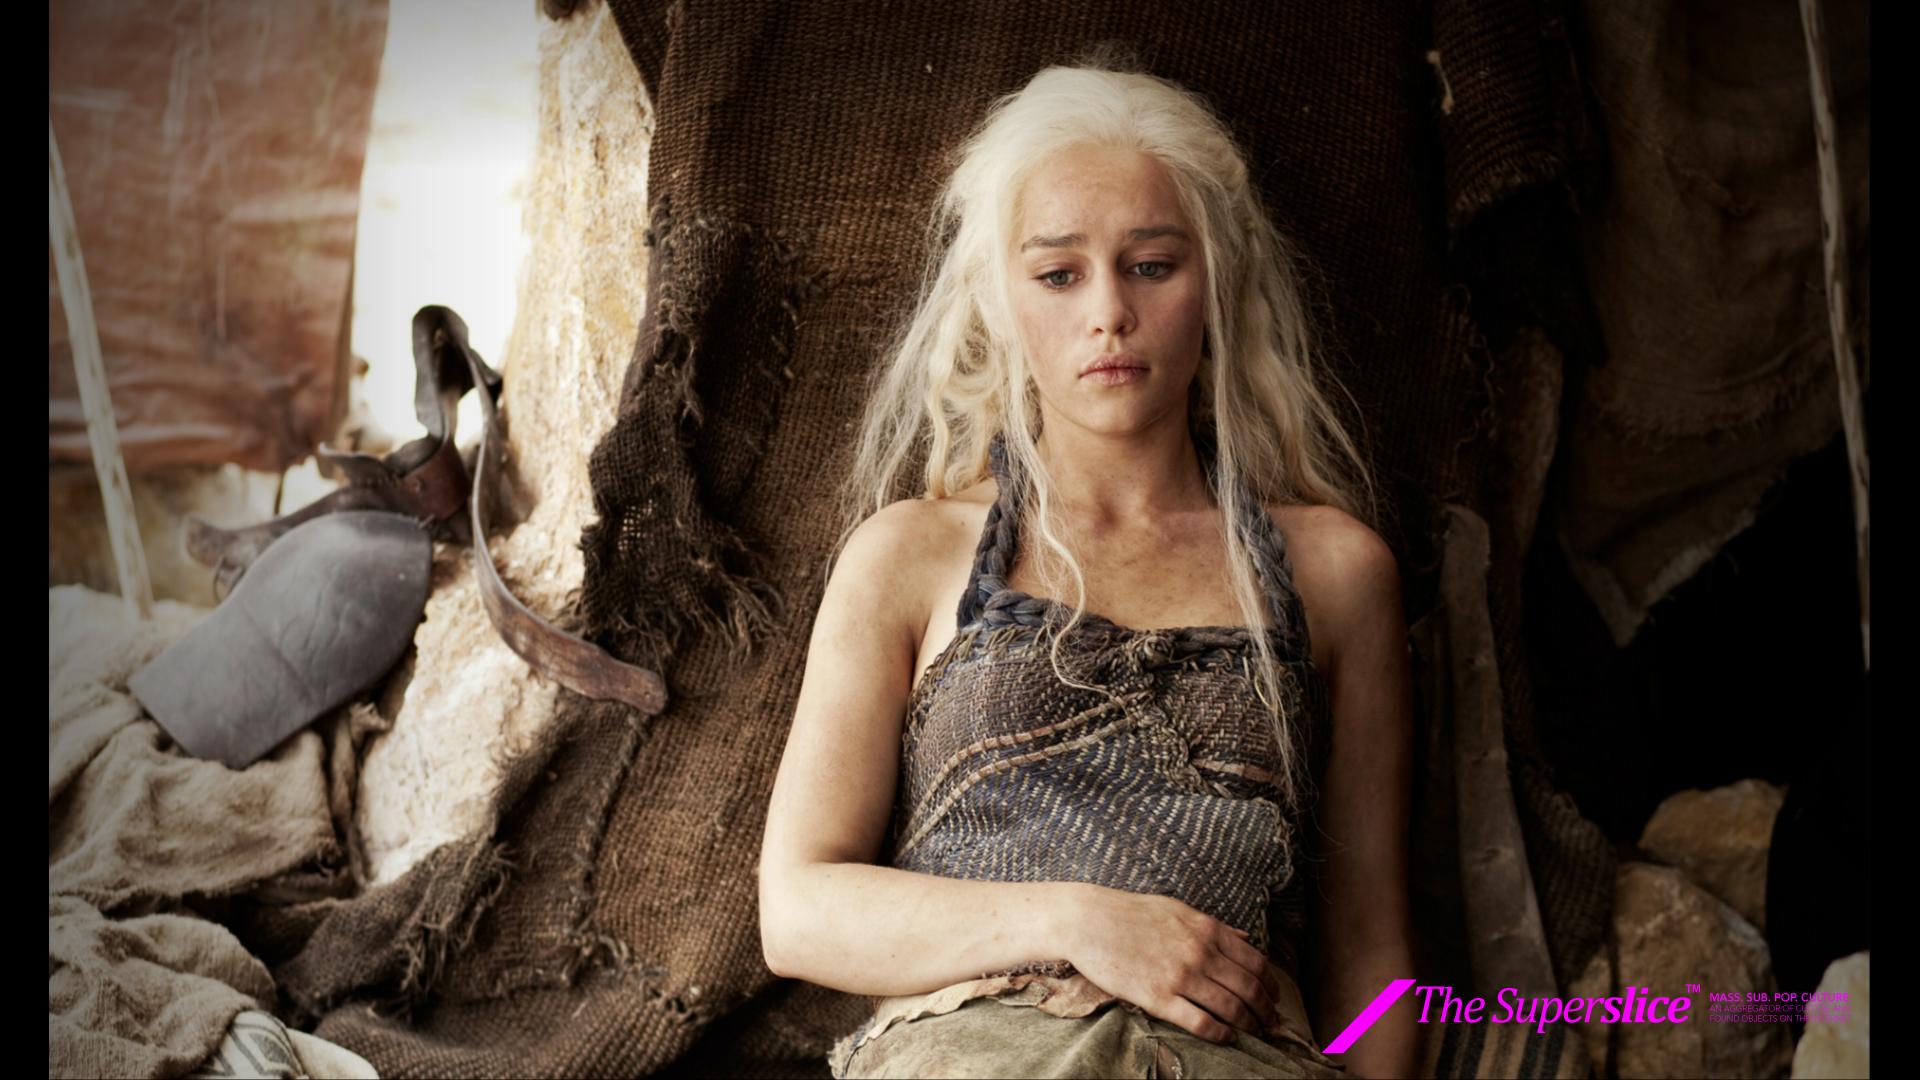 image Emilia clarke daenerys targaryen